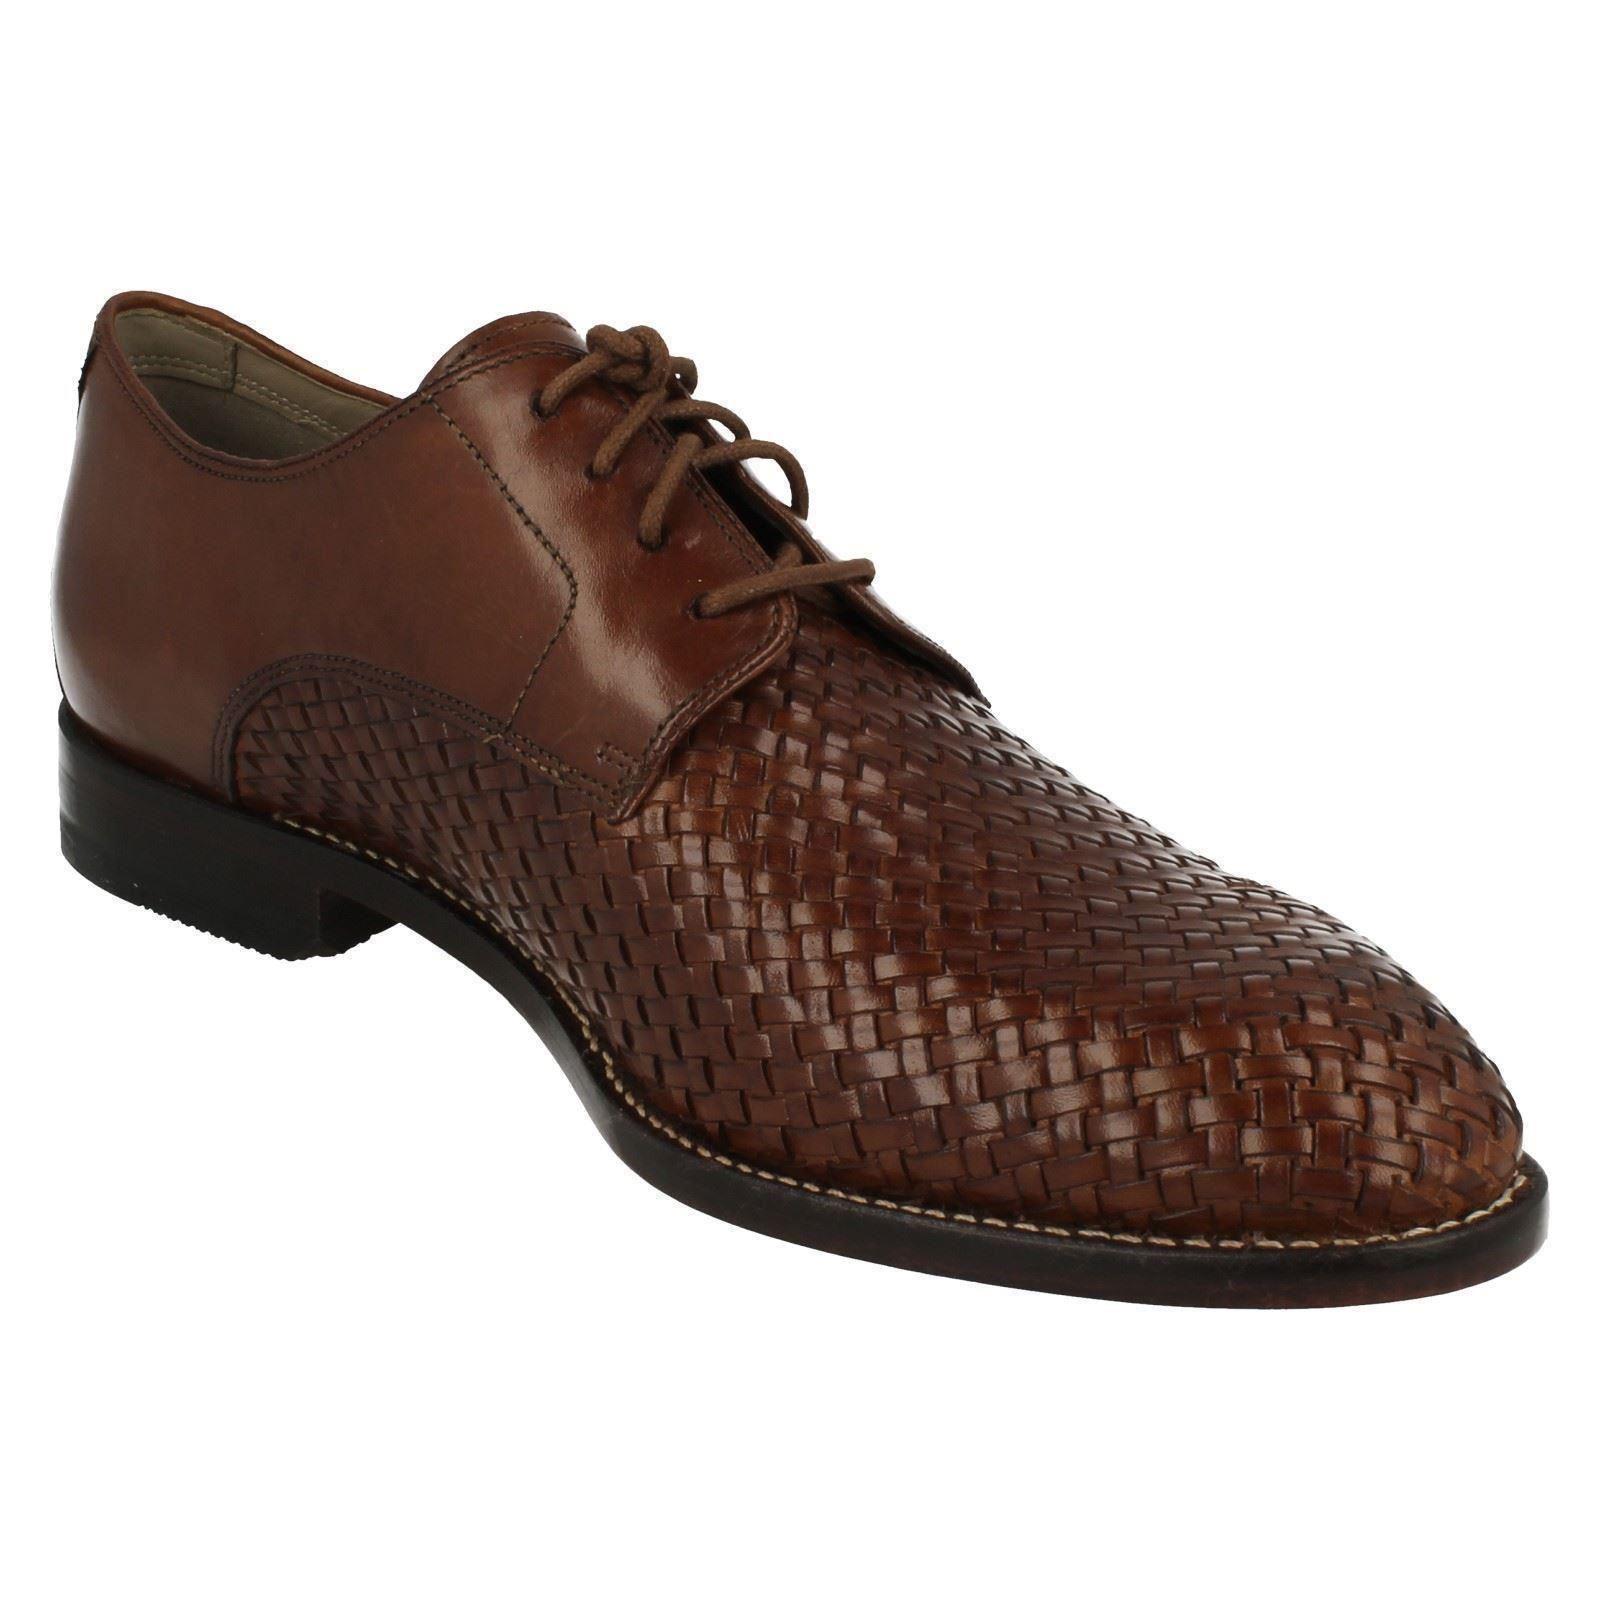 Mens Clarks Smart Lace Twinley Up Shoes, Twinley Lace Lace 9812af